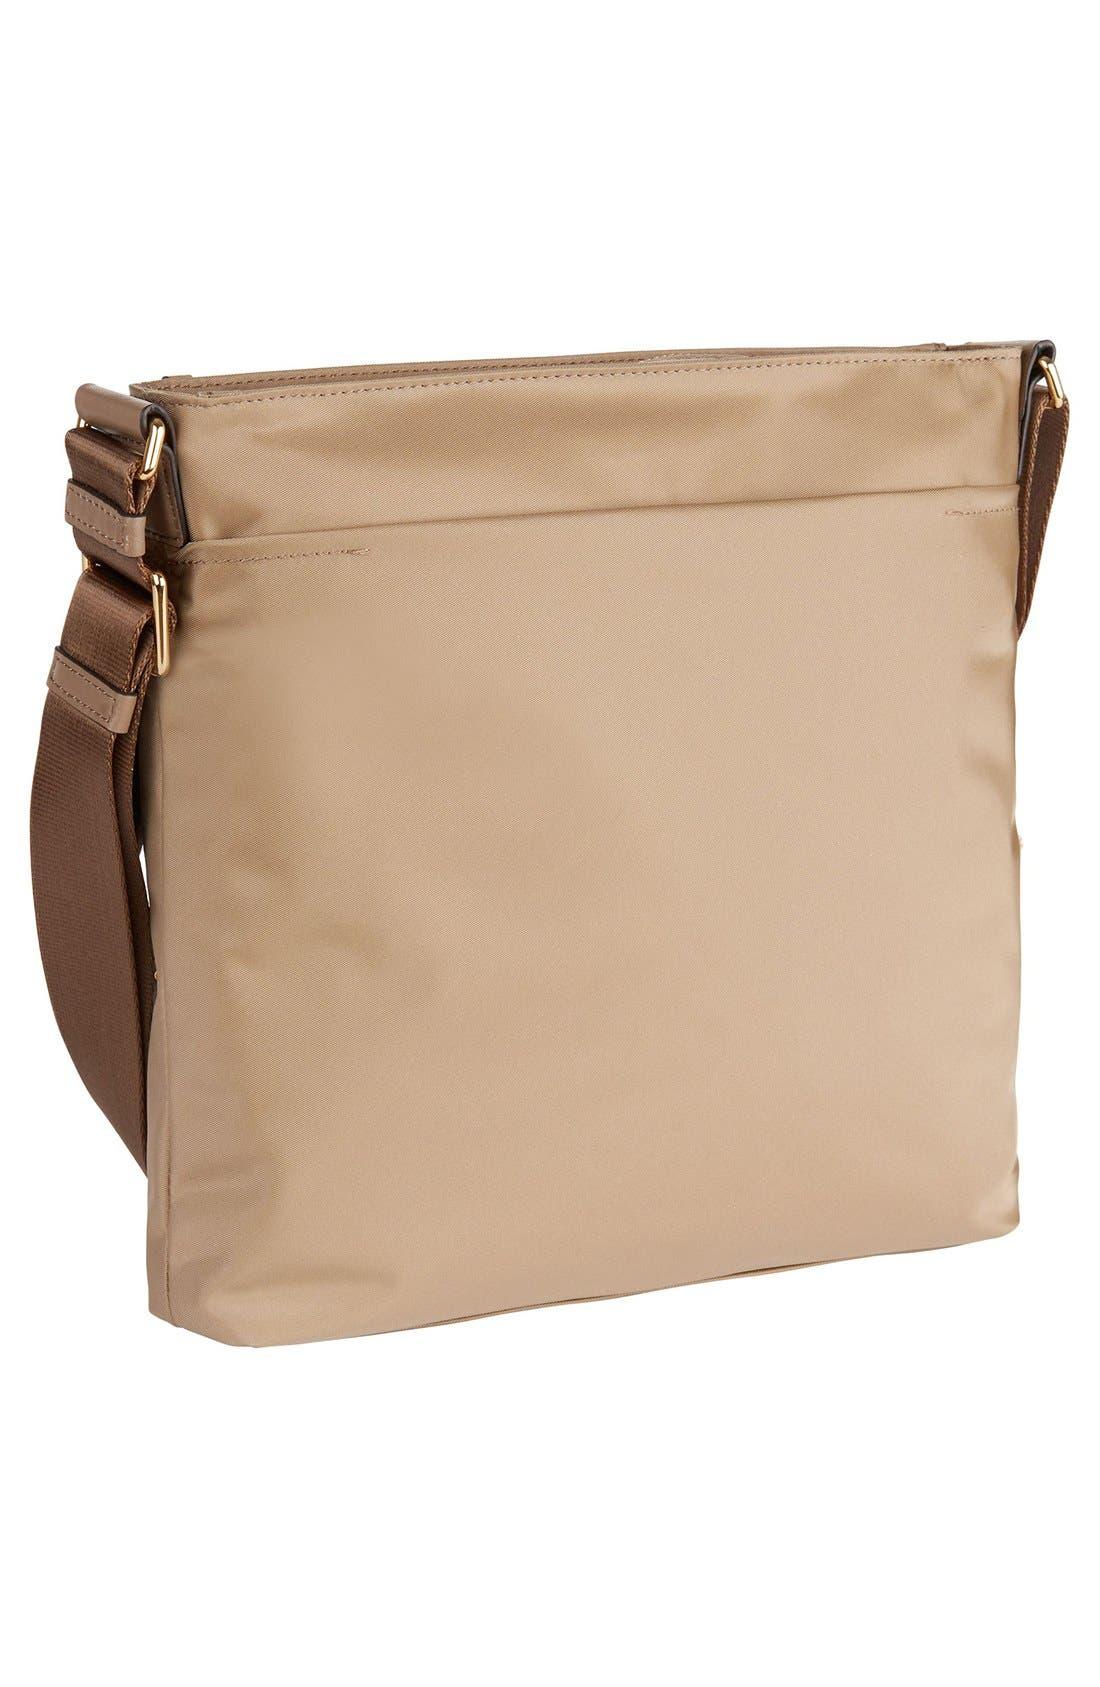 Voyageur - Capri Nylon Crossbody Bag,                             Alternate thumbnail 4, color,                             KHAKI